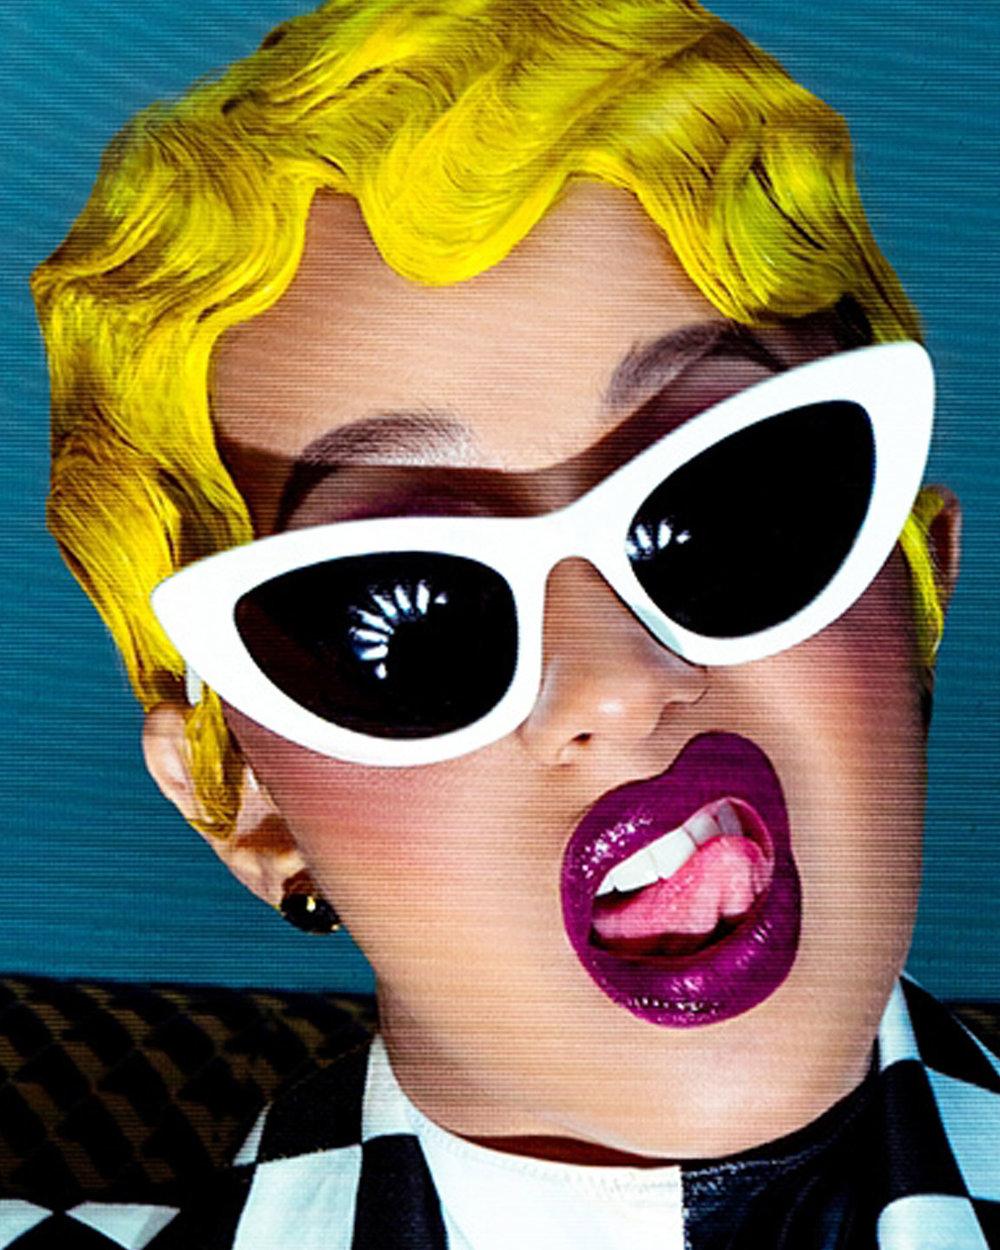 Blond Cardi B (2.5 hours)